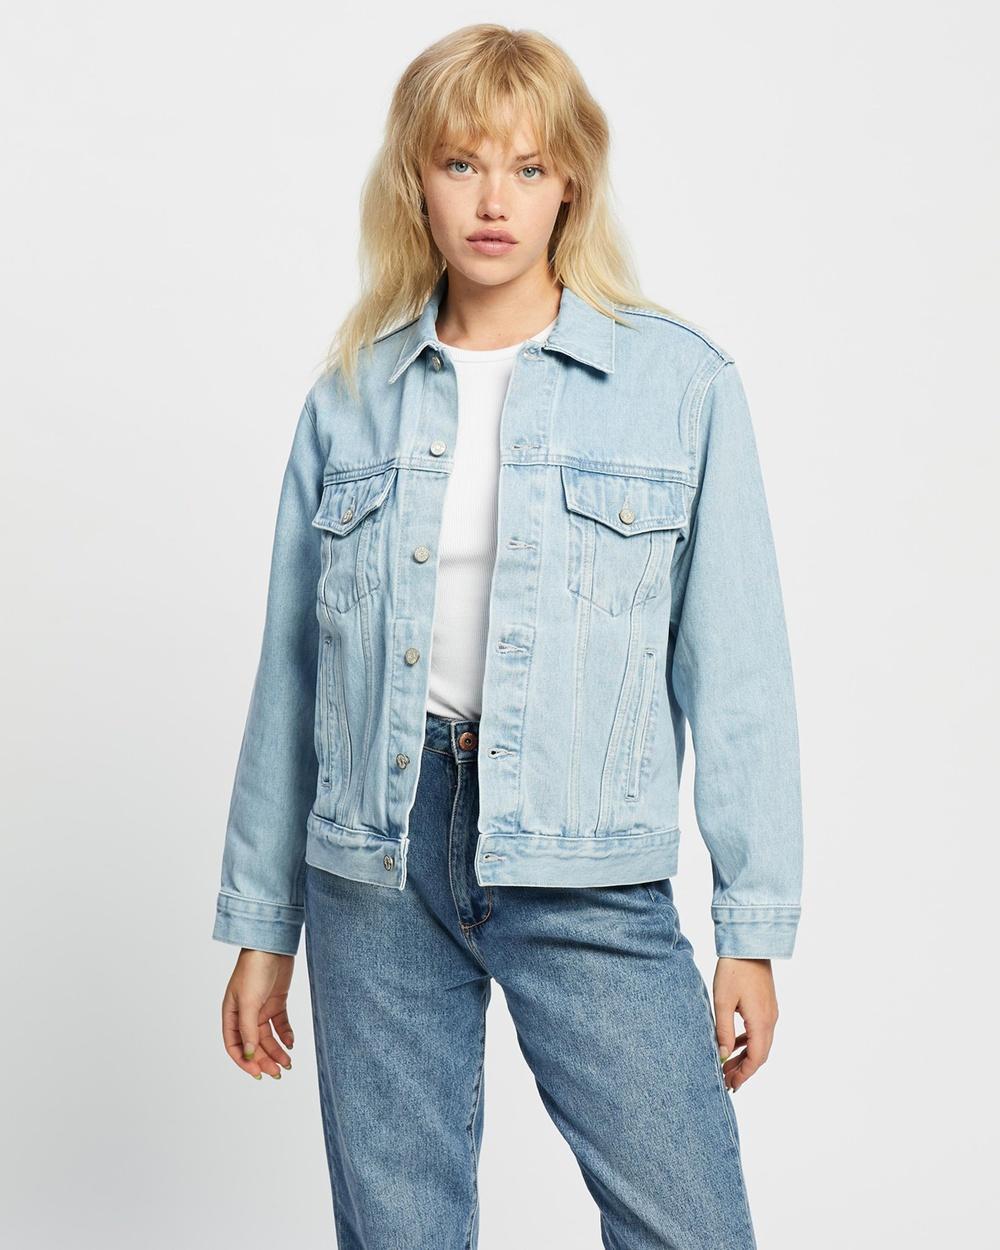 Assembly Label Tome Denim Jacket jacket Pacific Blue